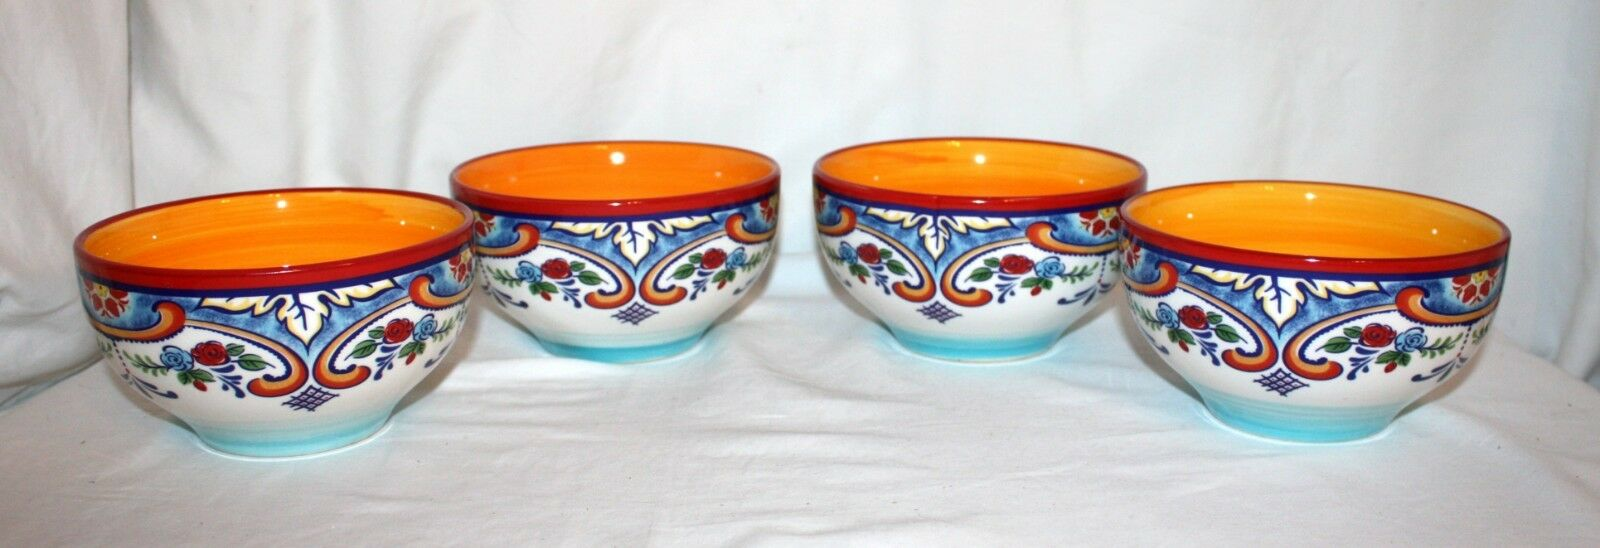 Euro Ceramica ZANZIBAR Soup Cereal Bowls Set Of 4 Pc Multi-color Floral